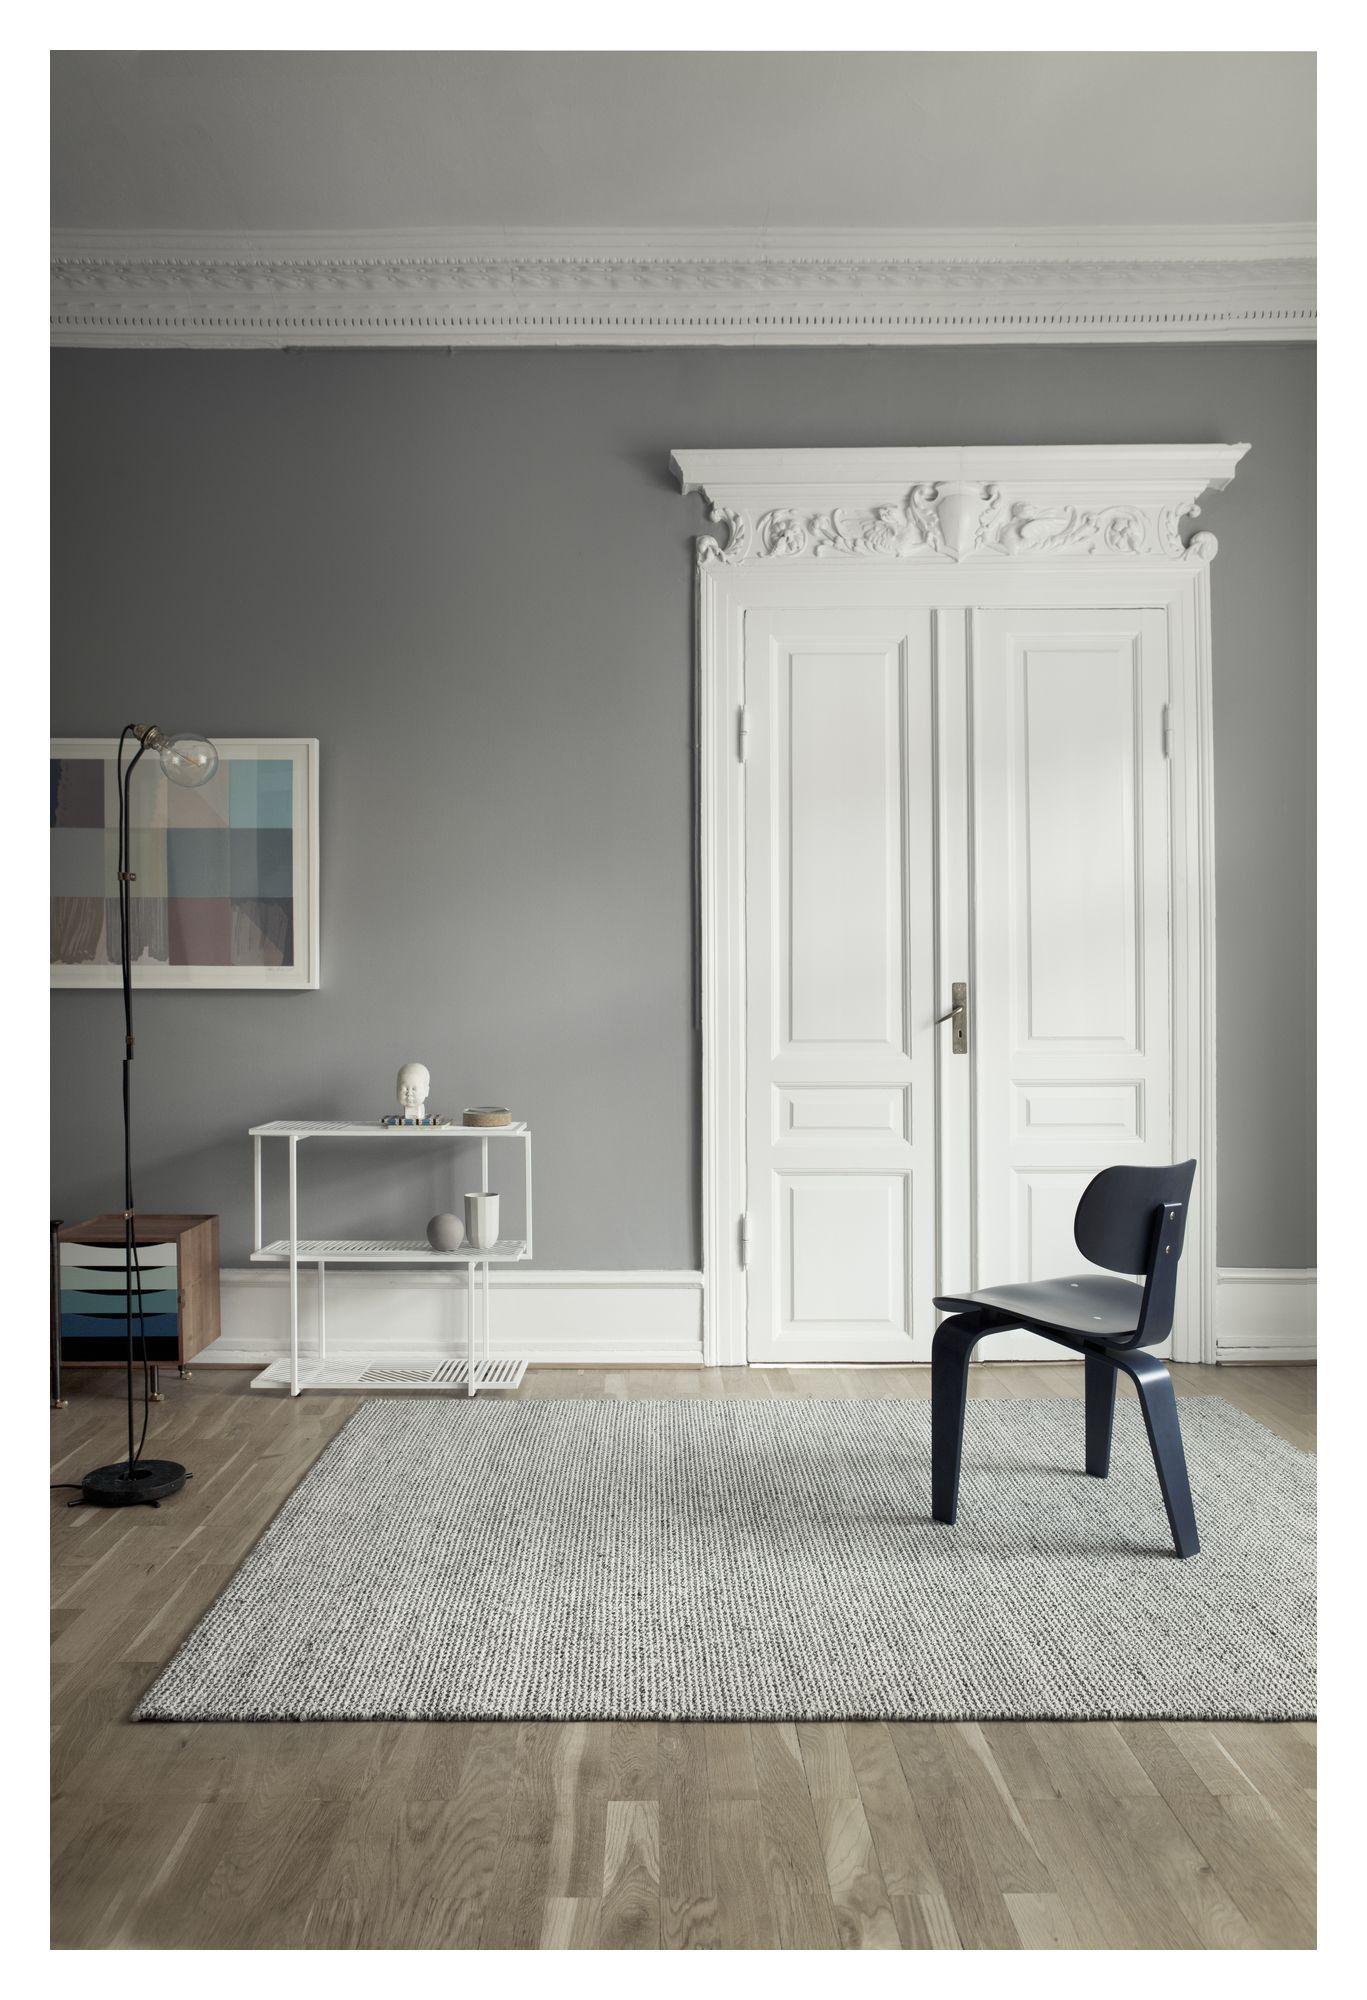 Fabula Living - Fenris Beige Kelim - 250x350 - Kelimtæppe 350x250 cm